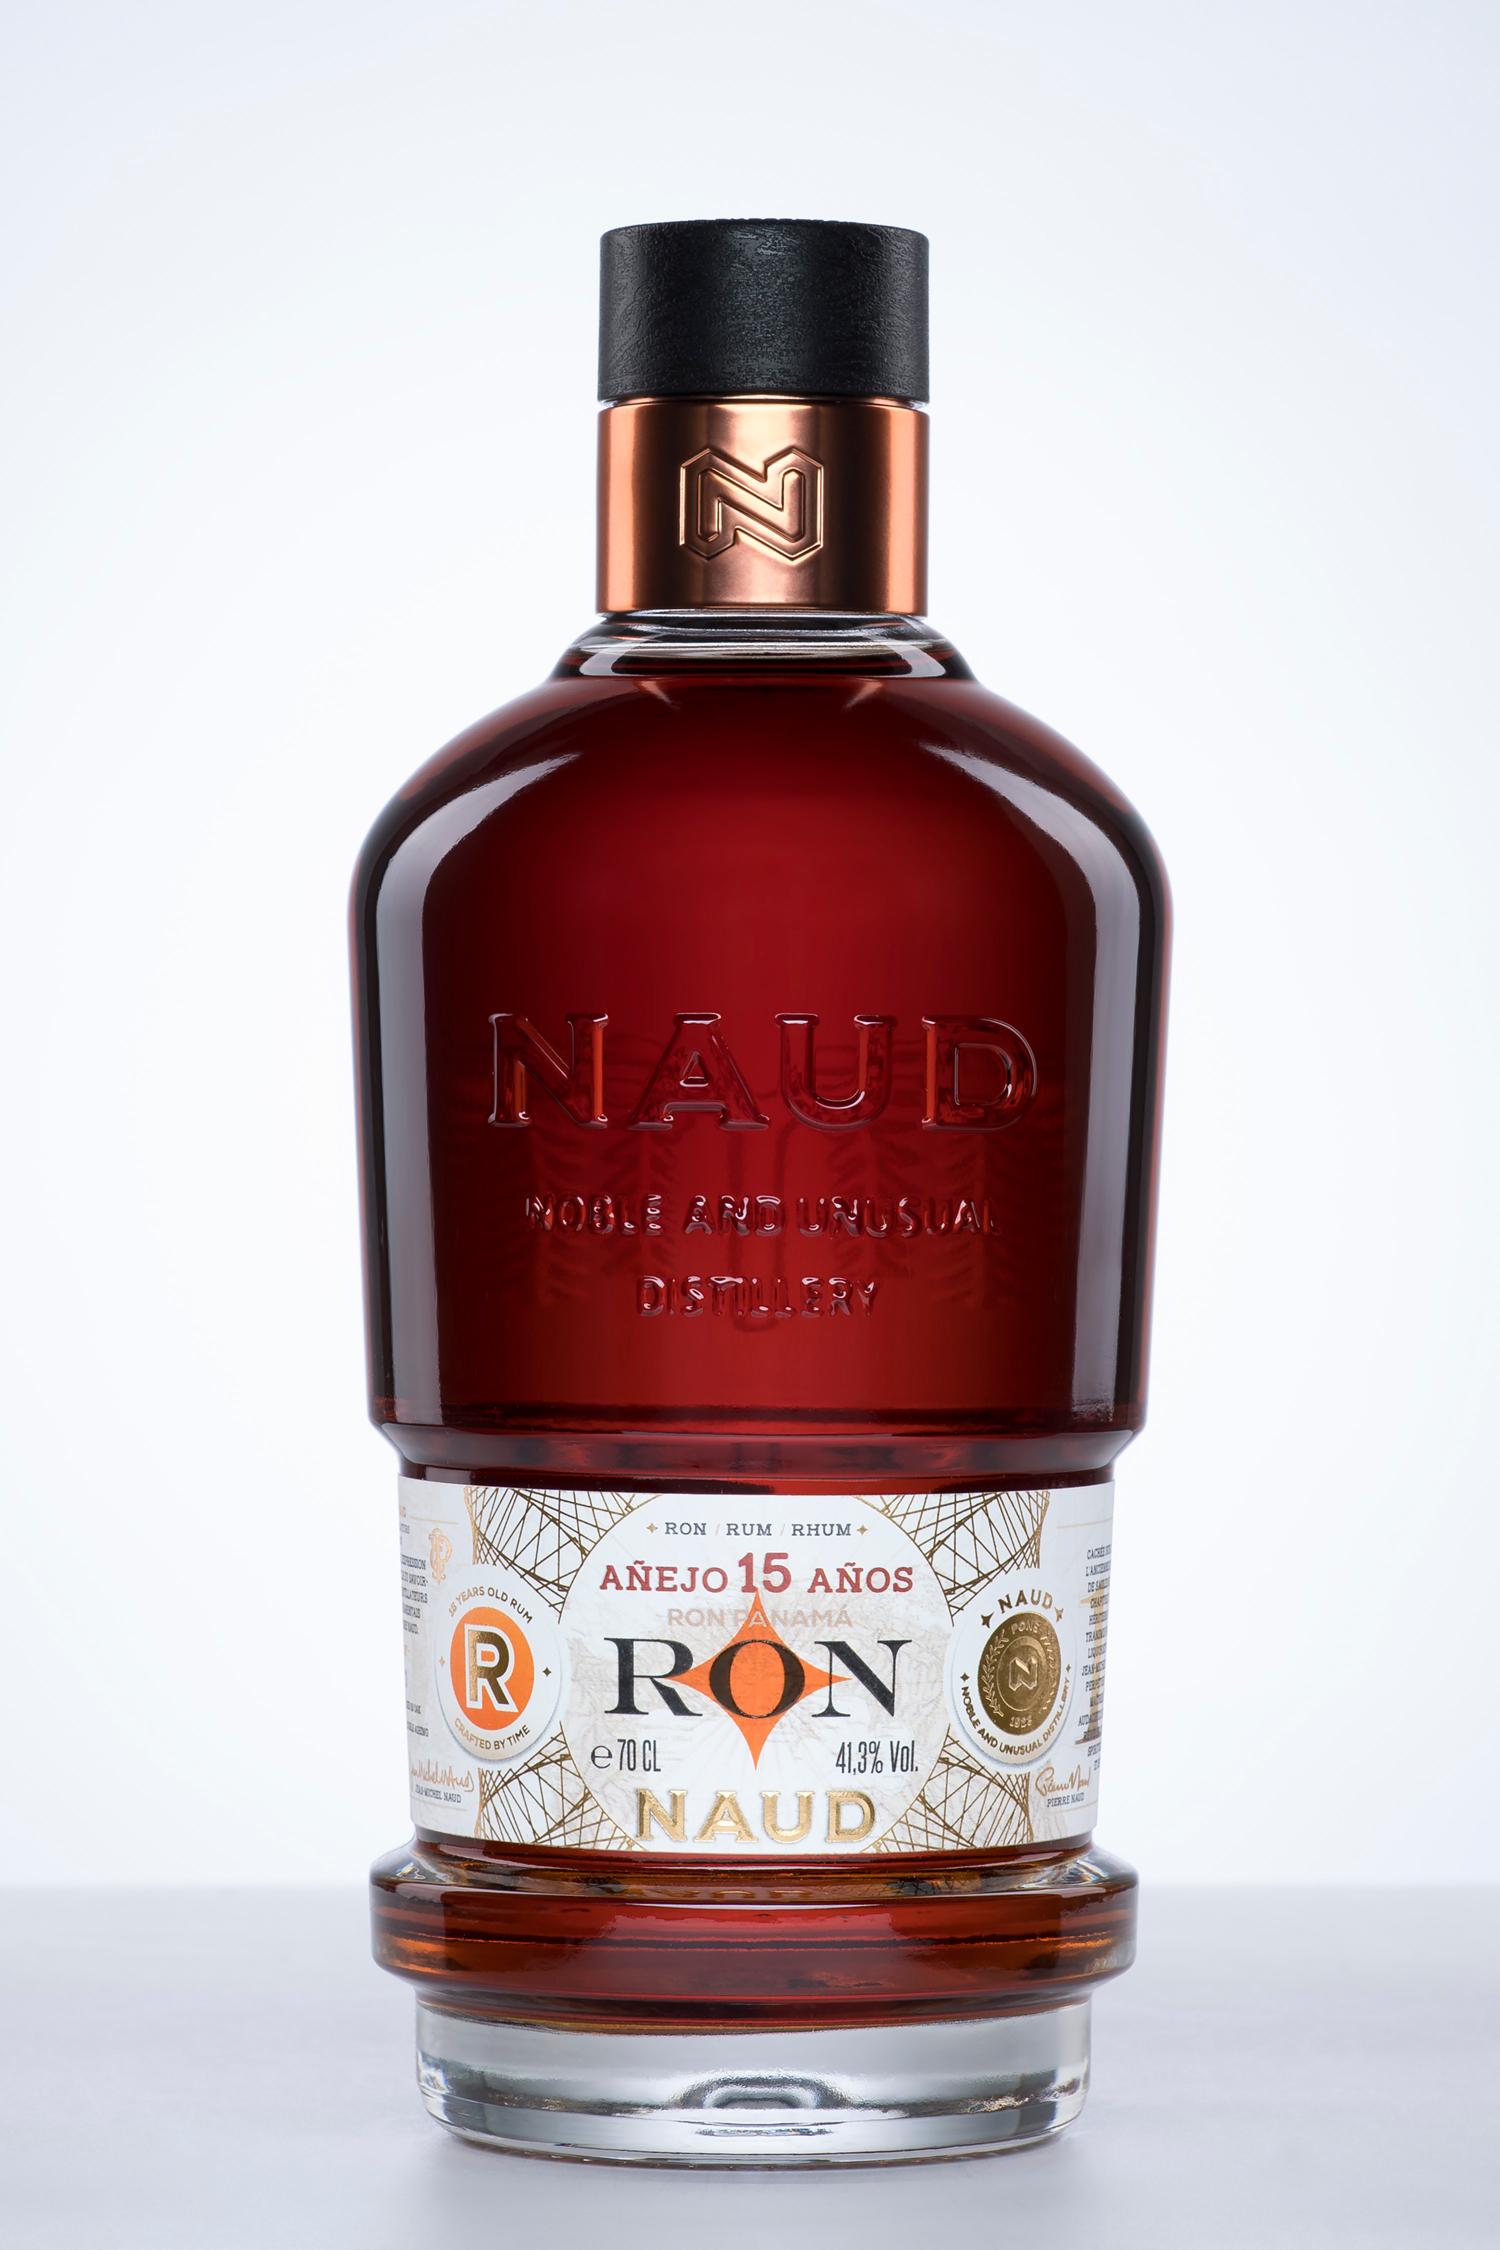 NAUD_Bouteilles_SPIRITUEUX_Cognac-Rhum-Gin-Vodka-Identite-Marque-Graphisme-Etiquette_PLANET-DESIGN-PARIS-Eric-Berthes_07.jpg